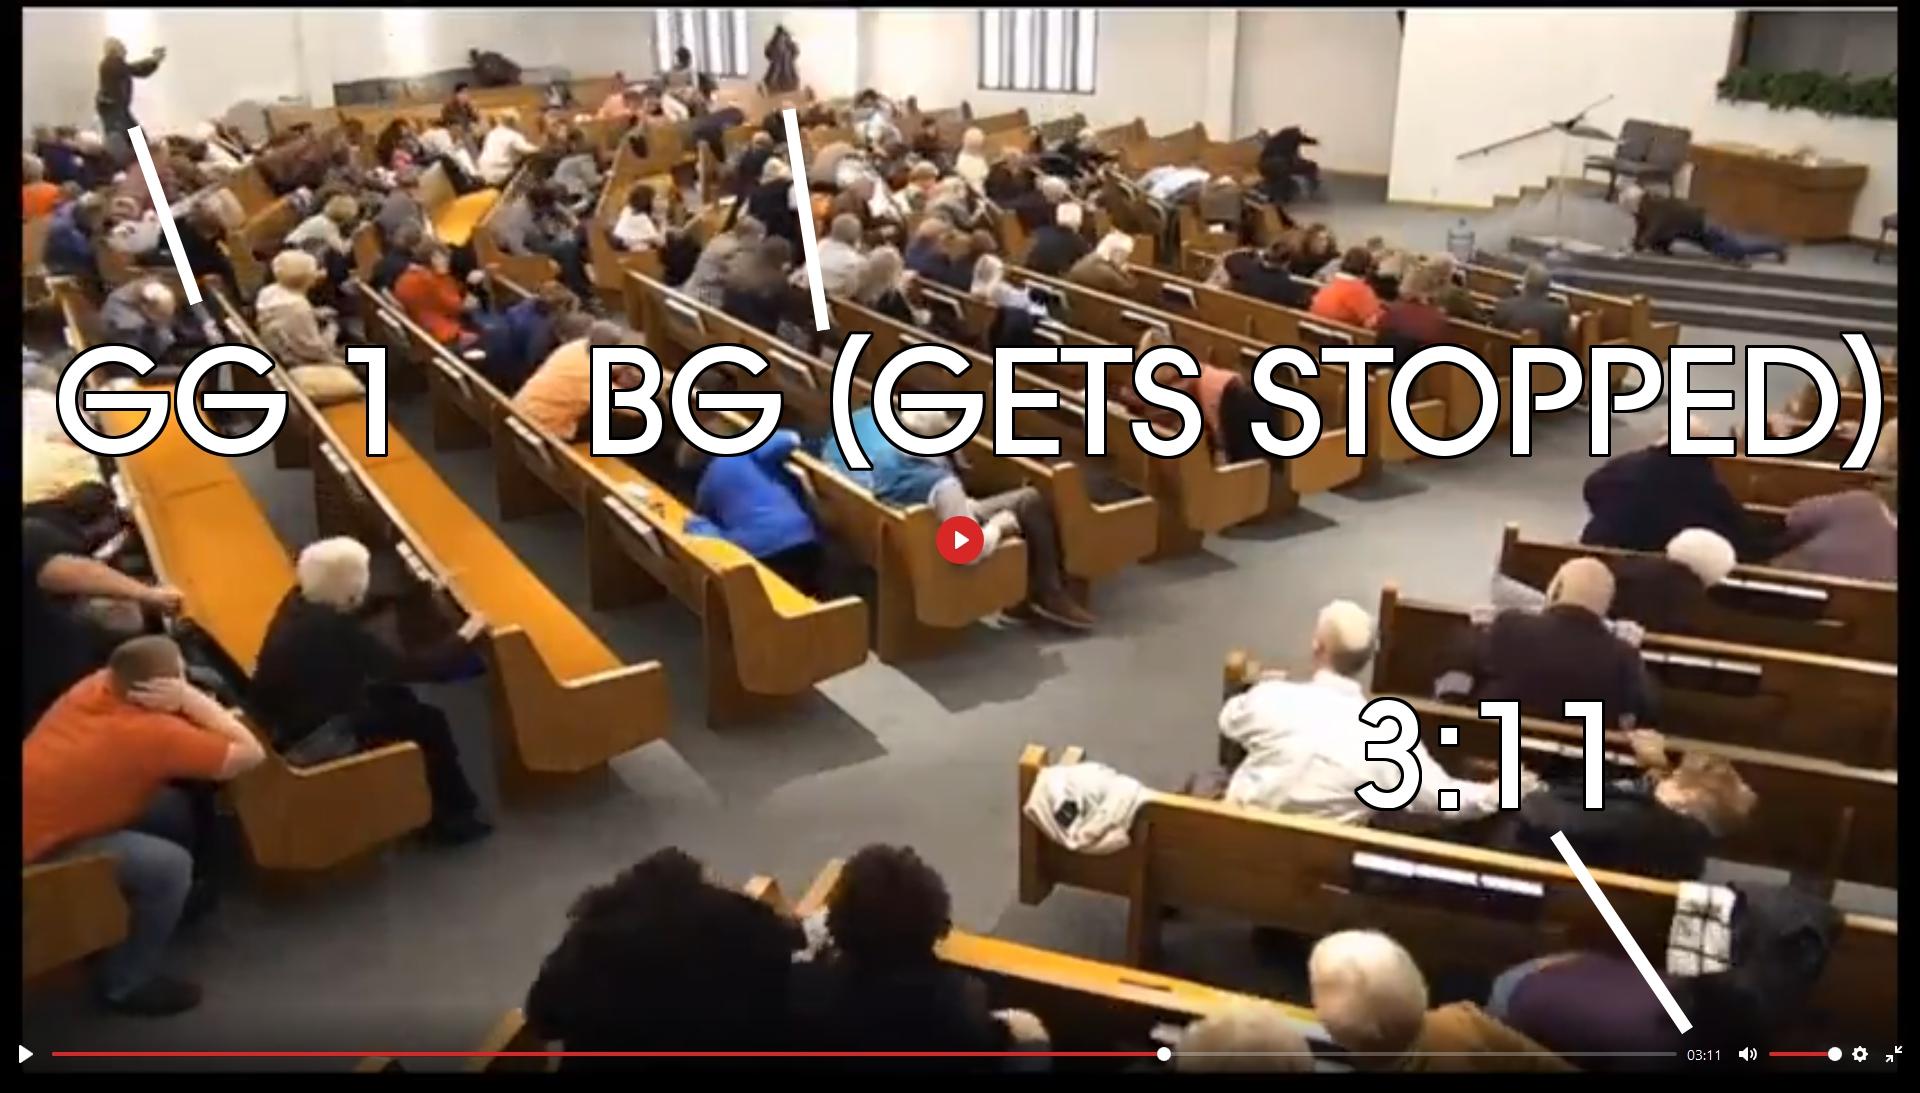 Streaming Video of the White Settlement, TX, Church Shooting-ggwag-2.jpg